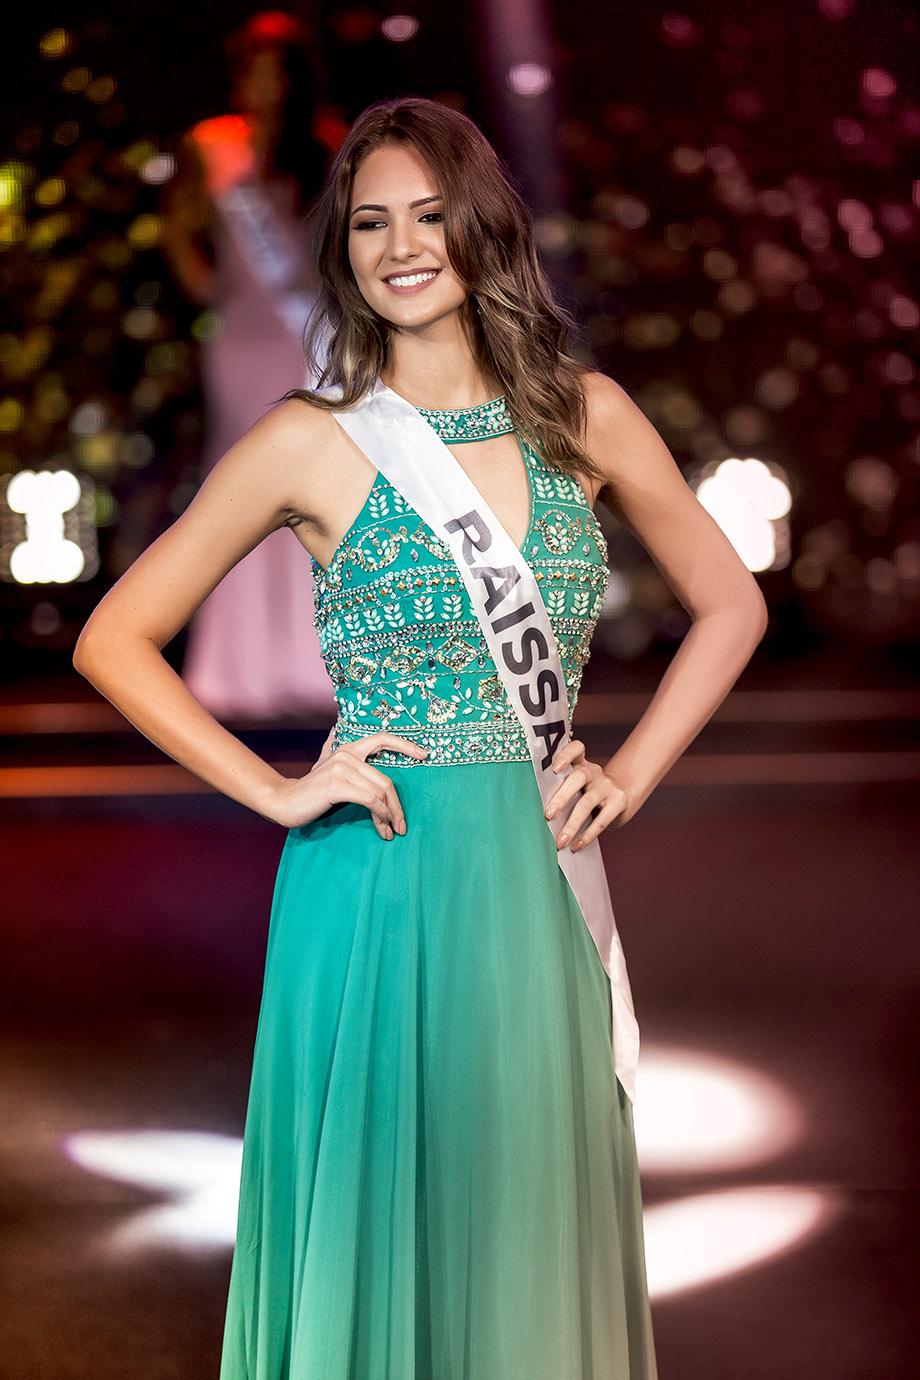 Blog Cris Moreira - Miss Fortaleza 2016 - 20